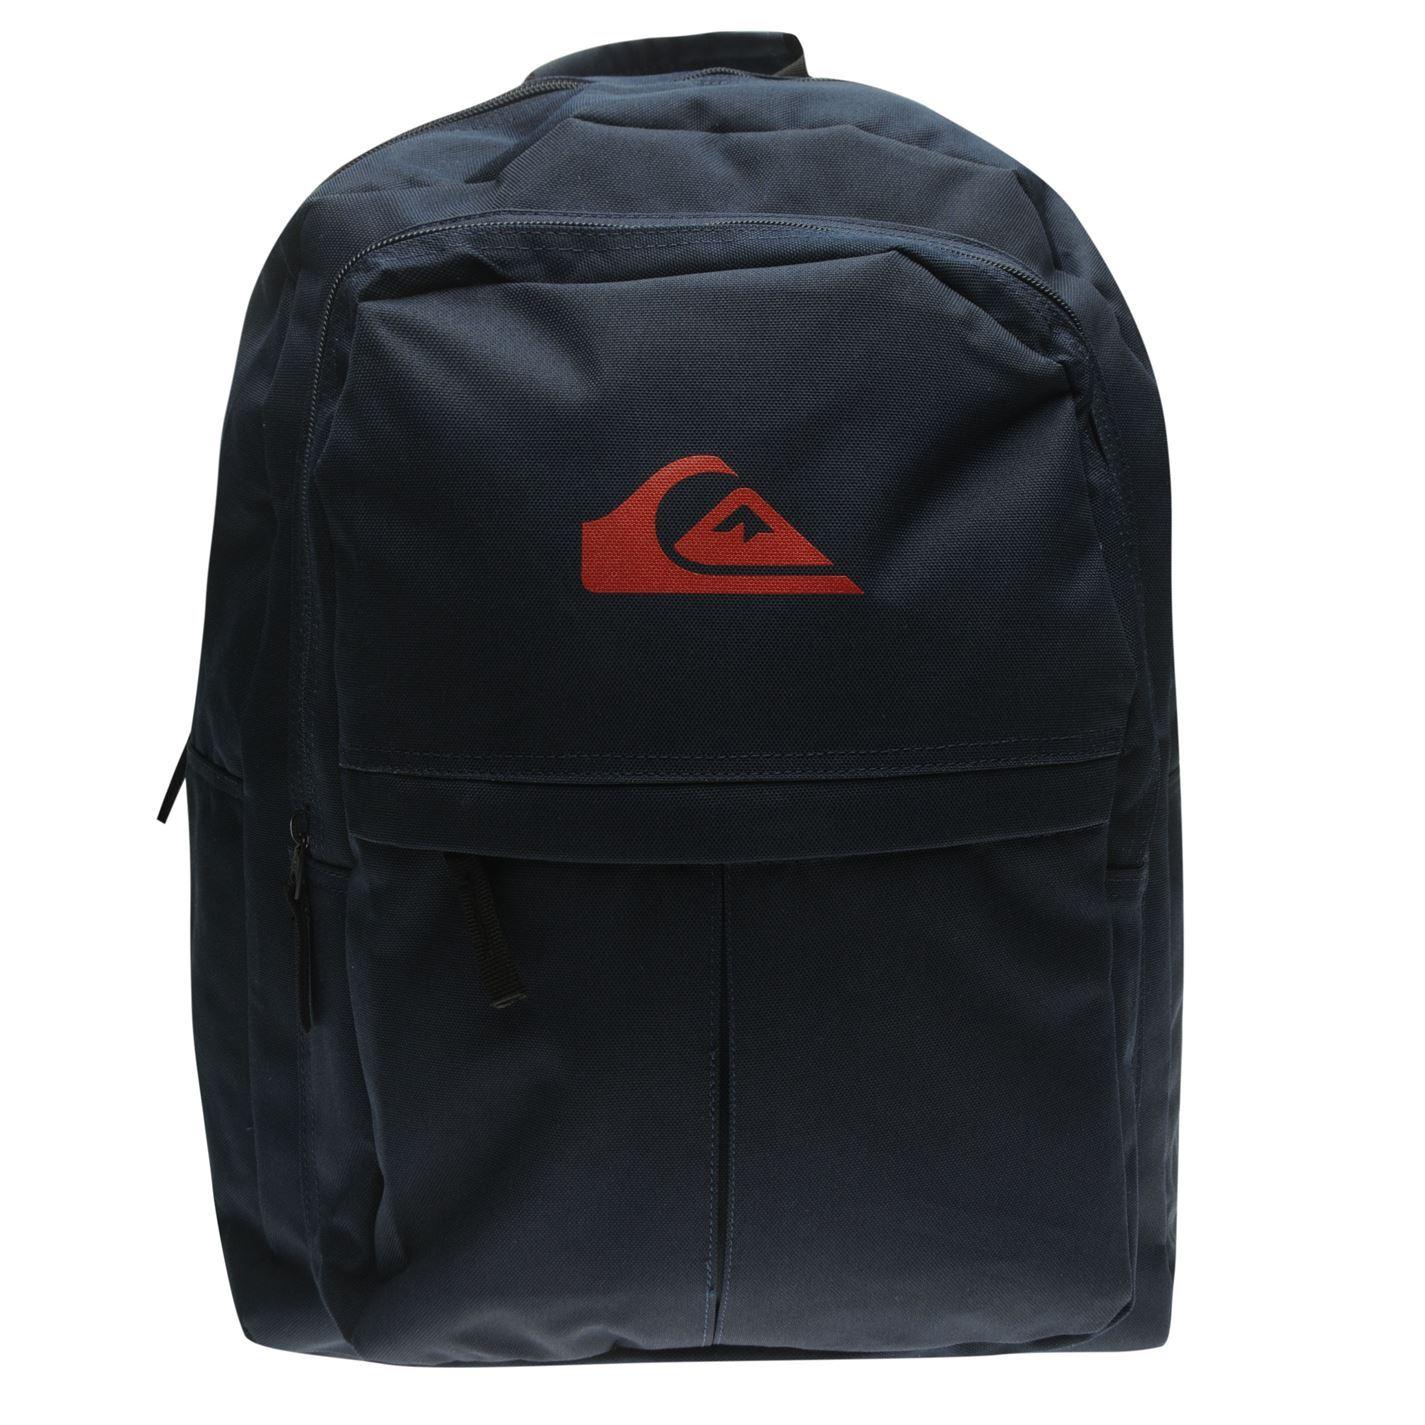 0b6b006f29 Quiksilver Plain Backpack Navy Rucksack Sports Bag Gymbag Kitbag